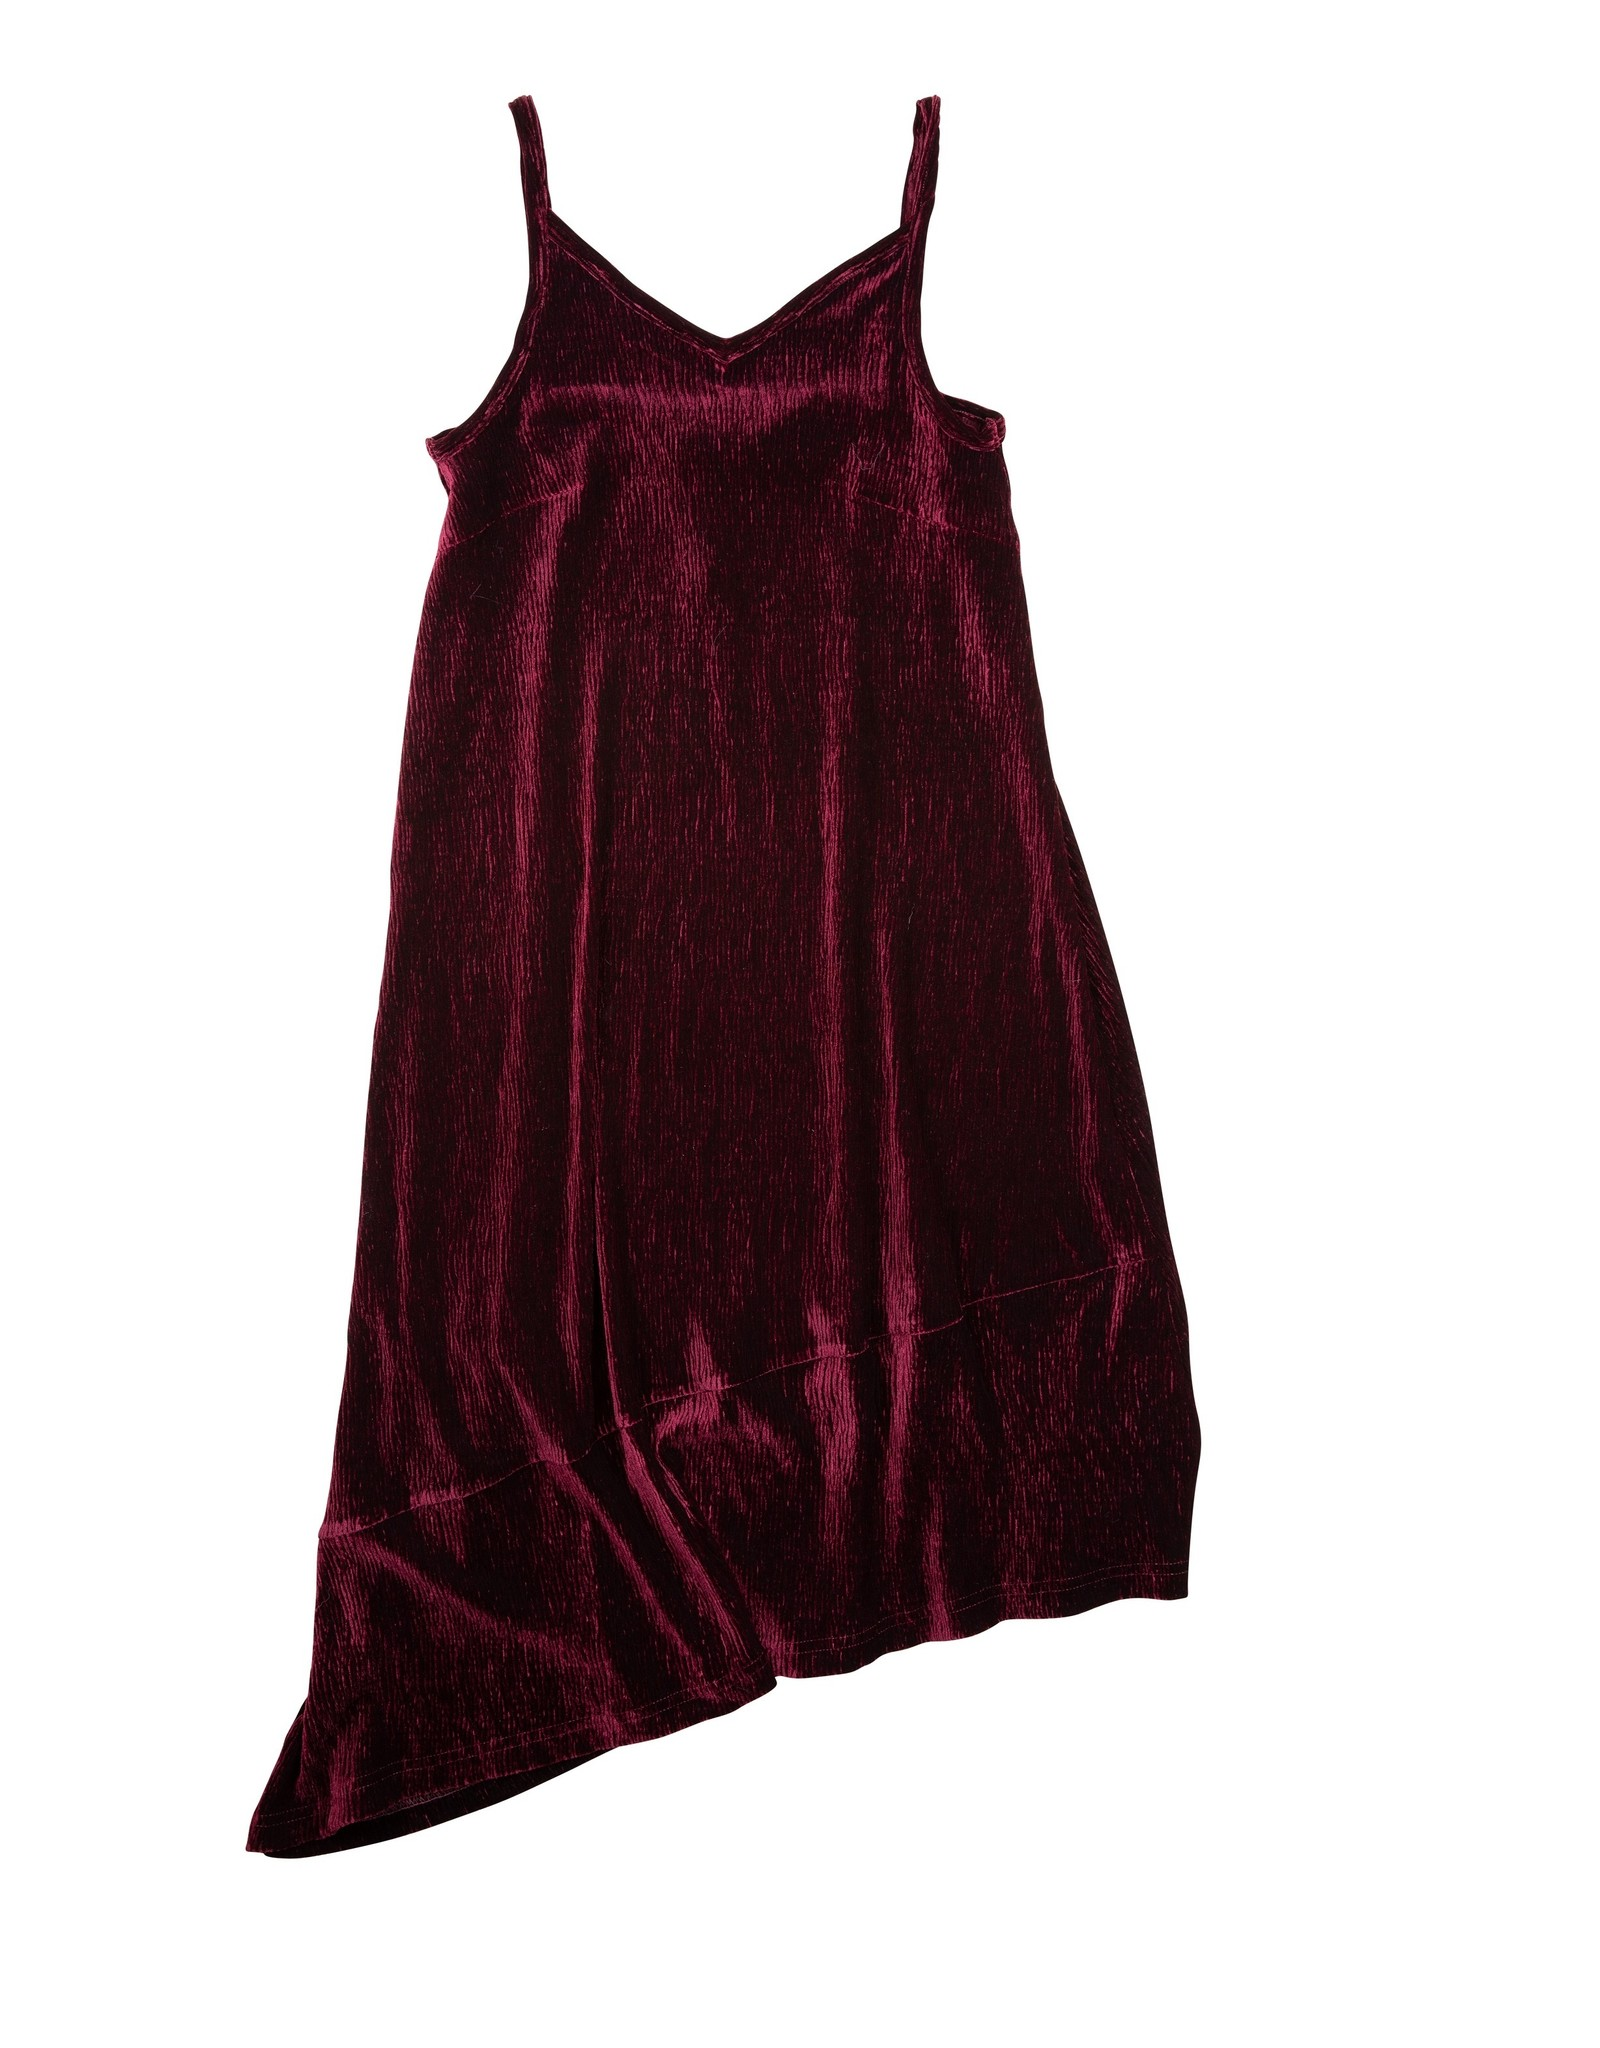 UNCLEAR Unclear Velour Asymetrical Slip Dress